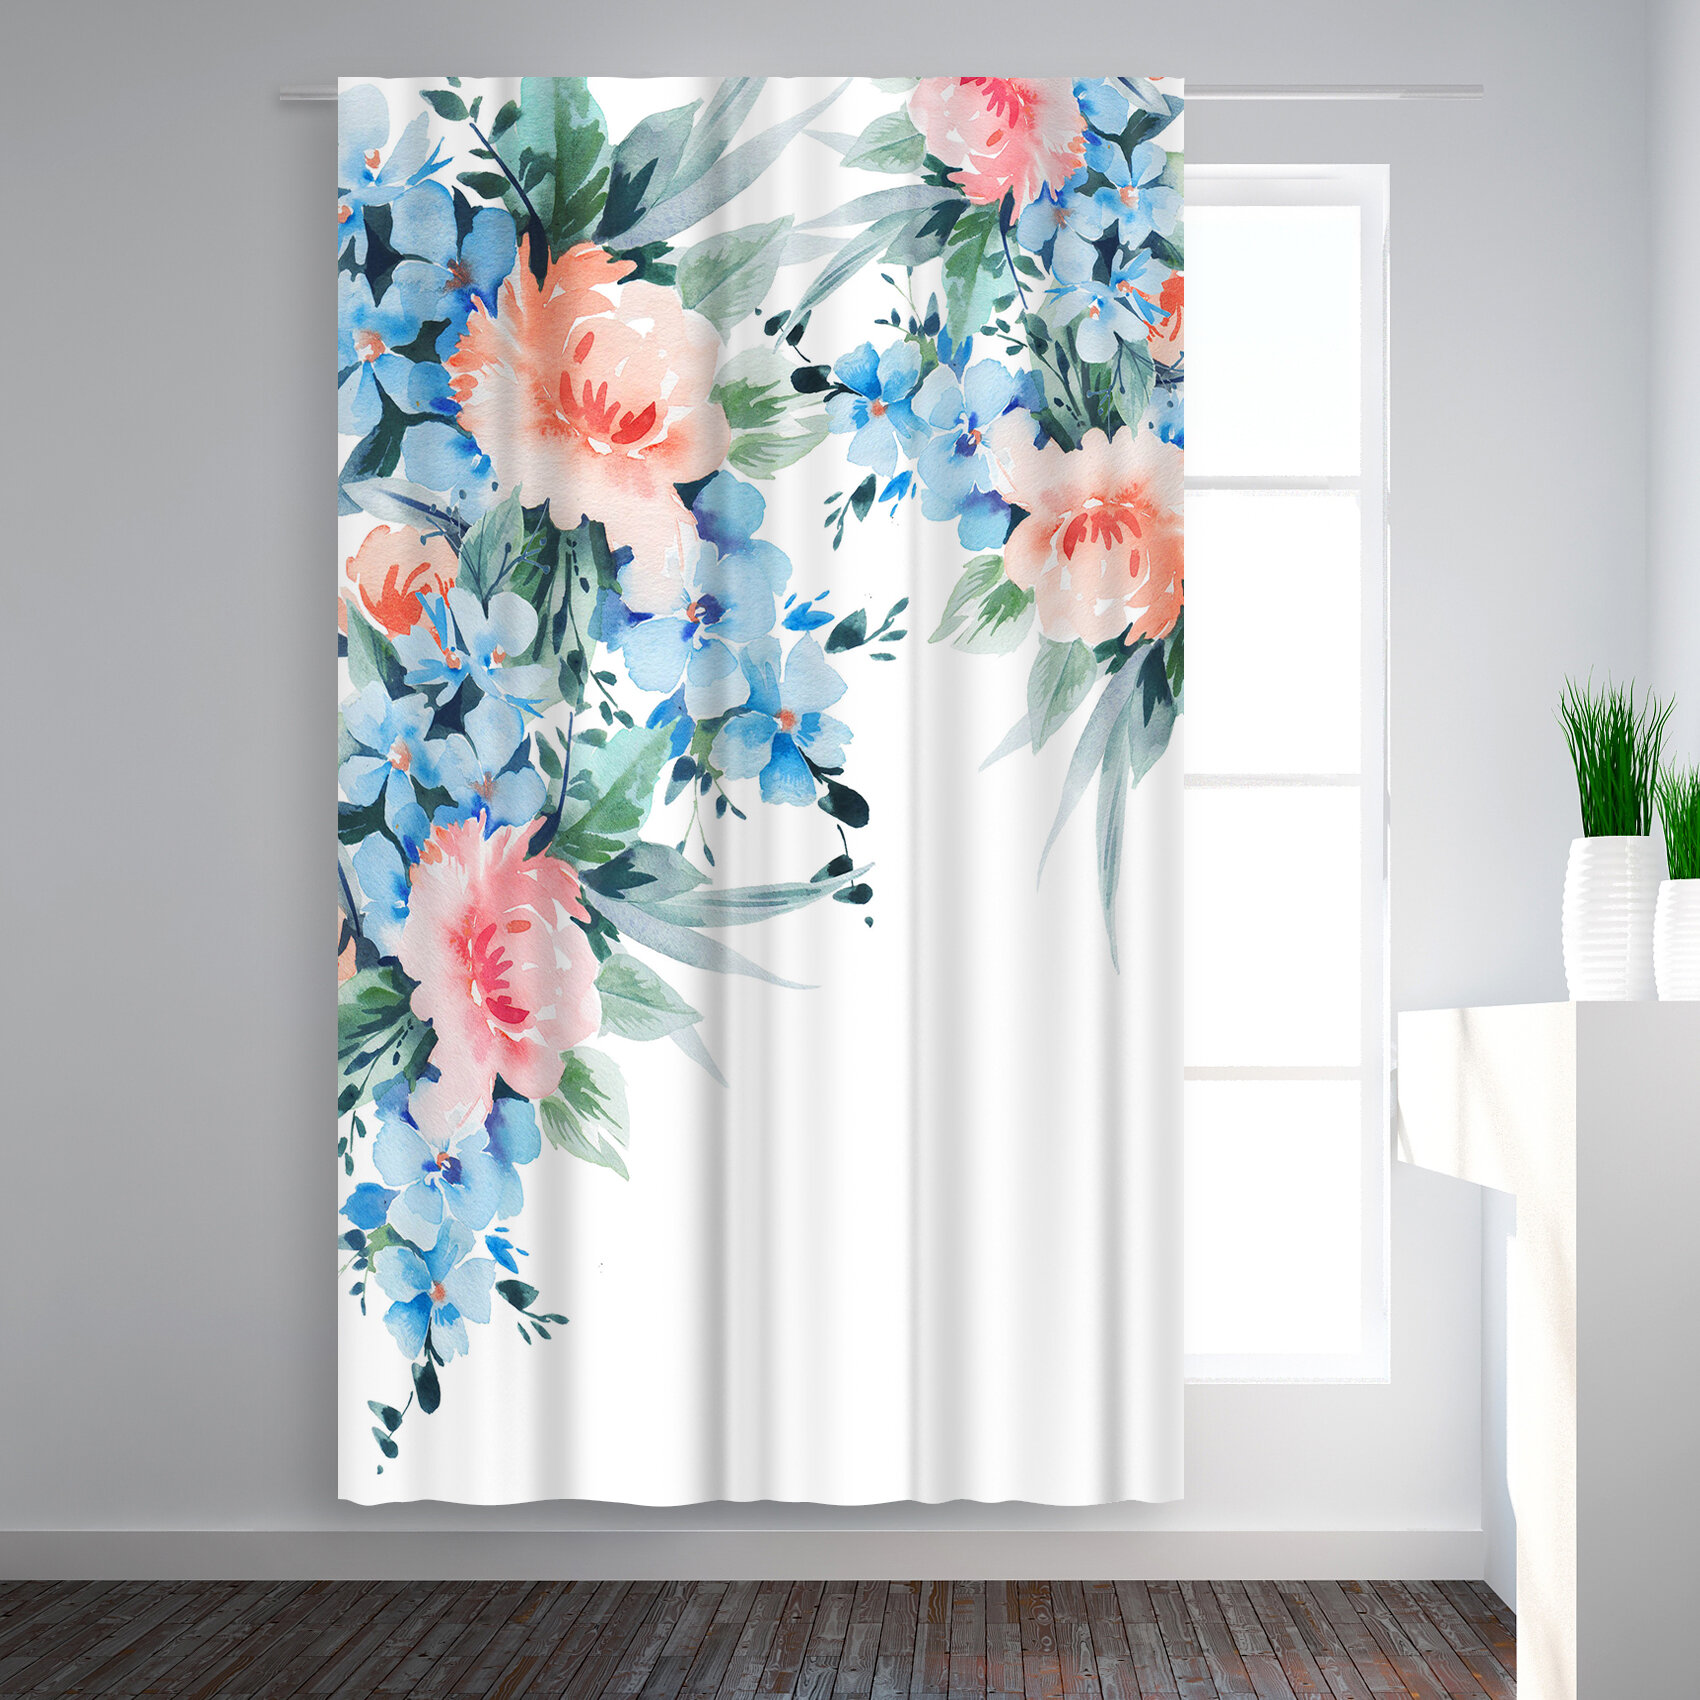 East Urban Home Victoria Nelson Blossom Bouquet Floral Blackout Rod Pocket Single Curtain Panel Wayfair